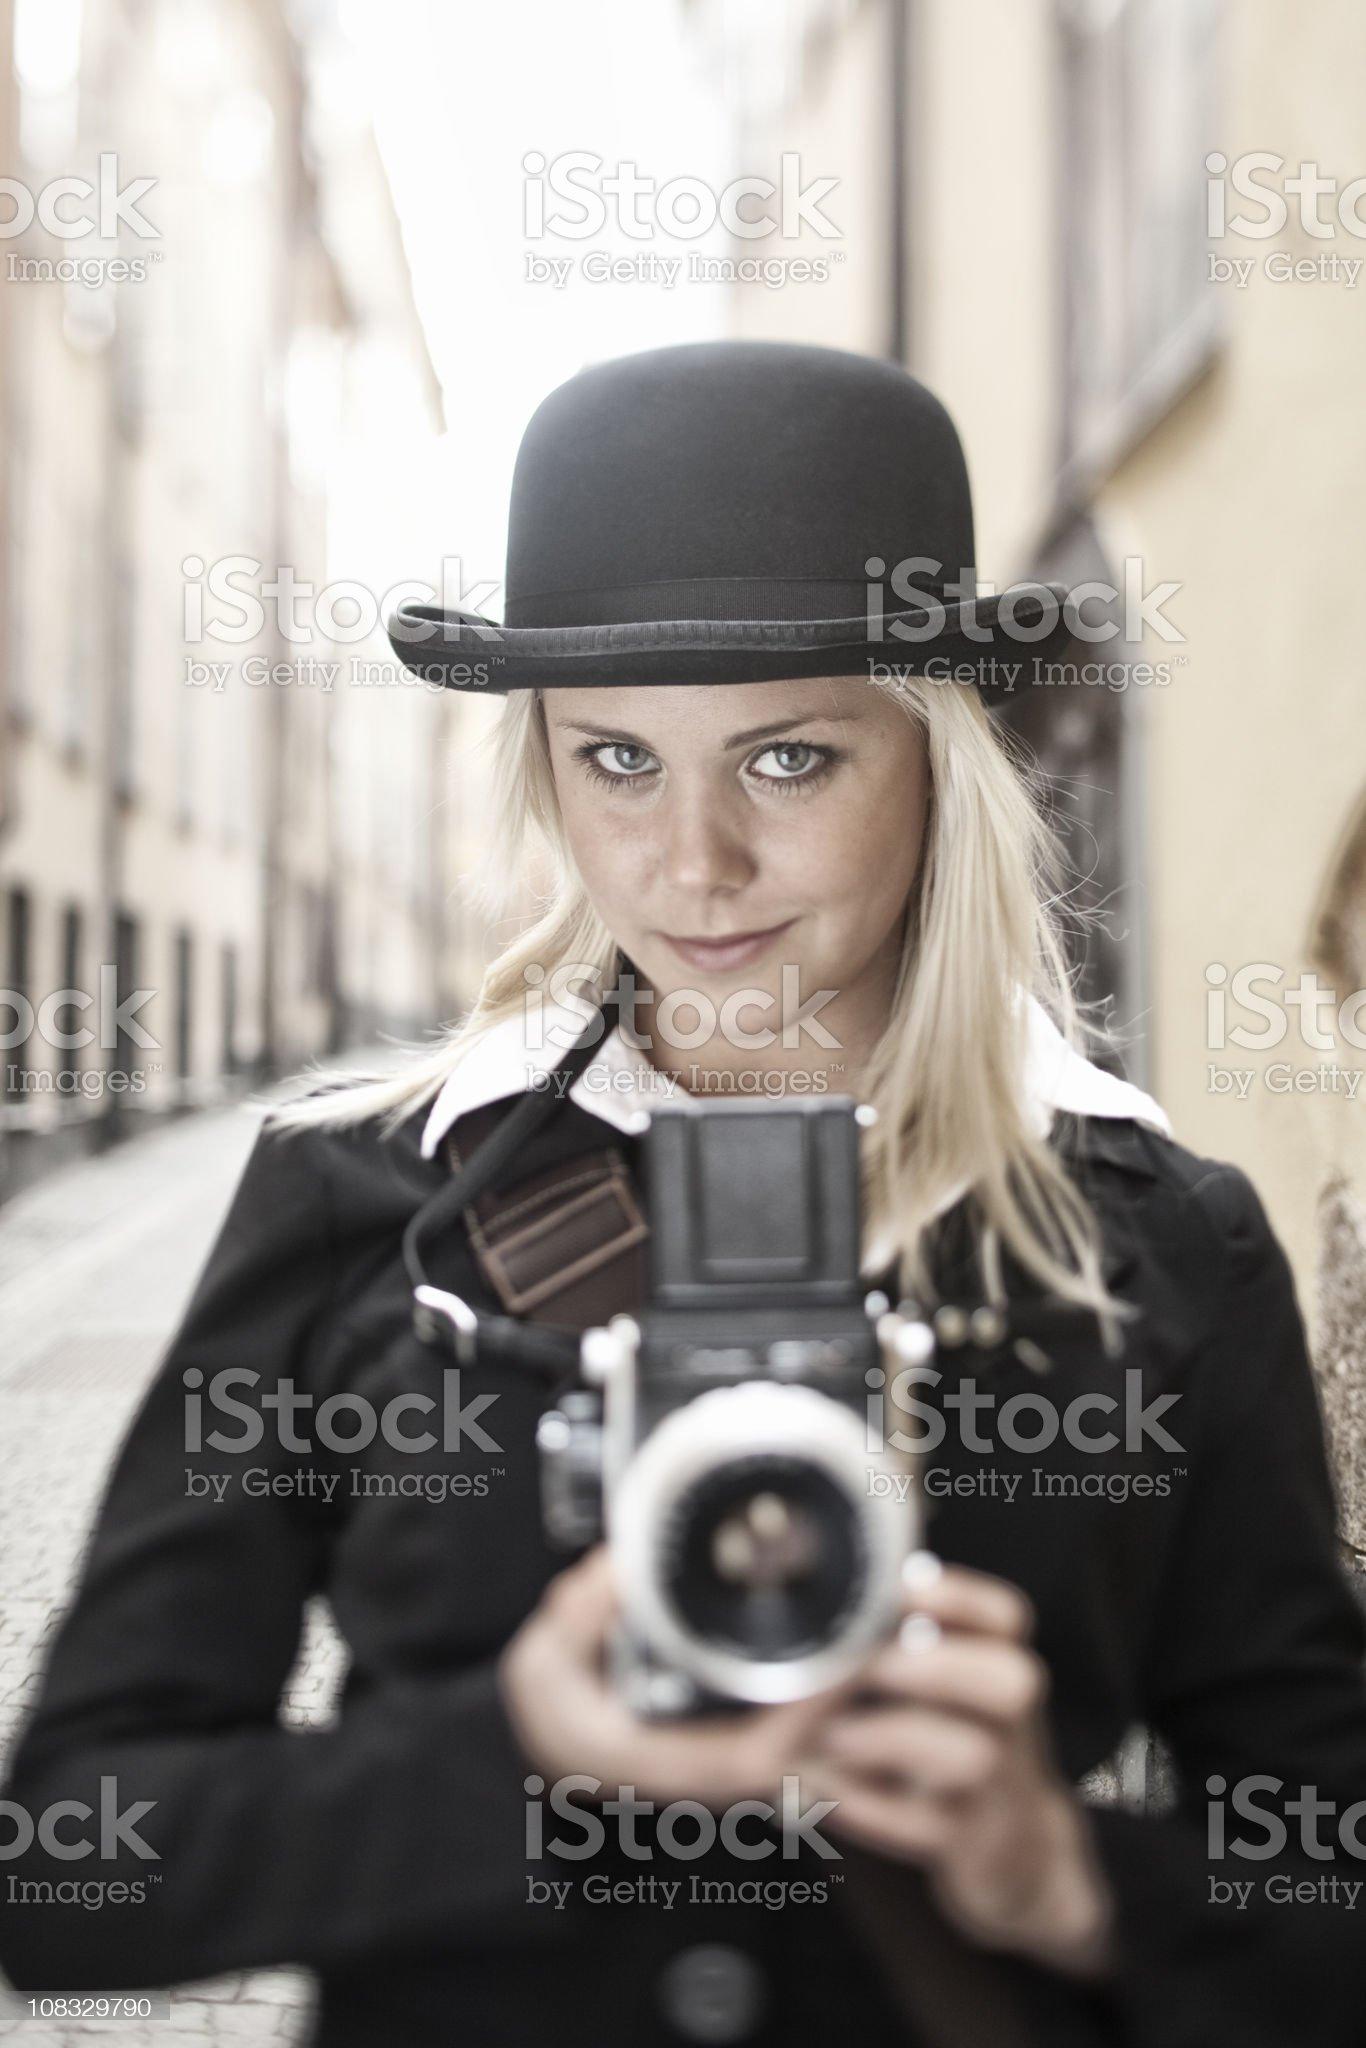 Photojournalist royalty-free stock photo